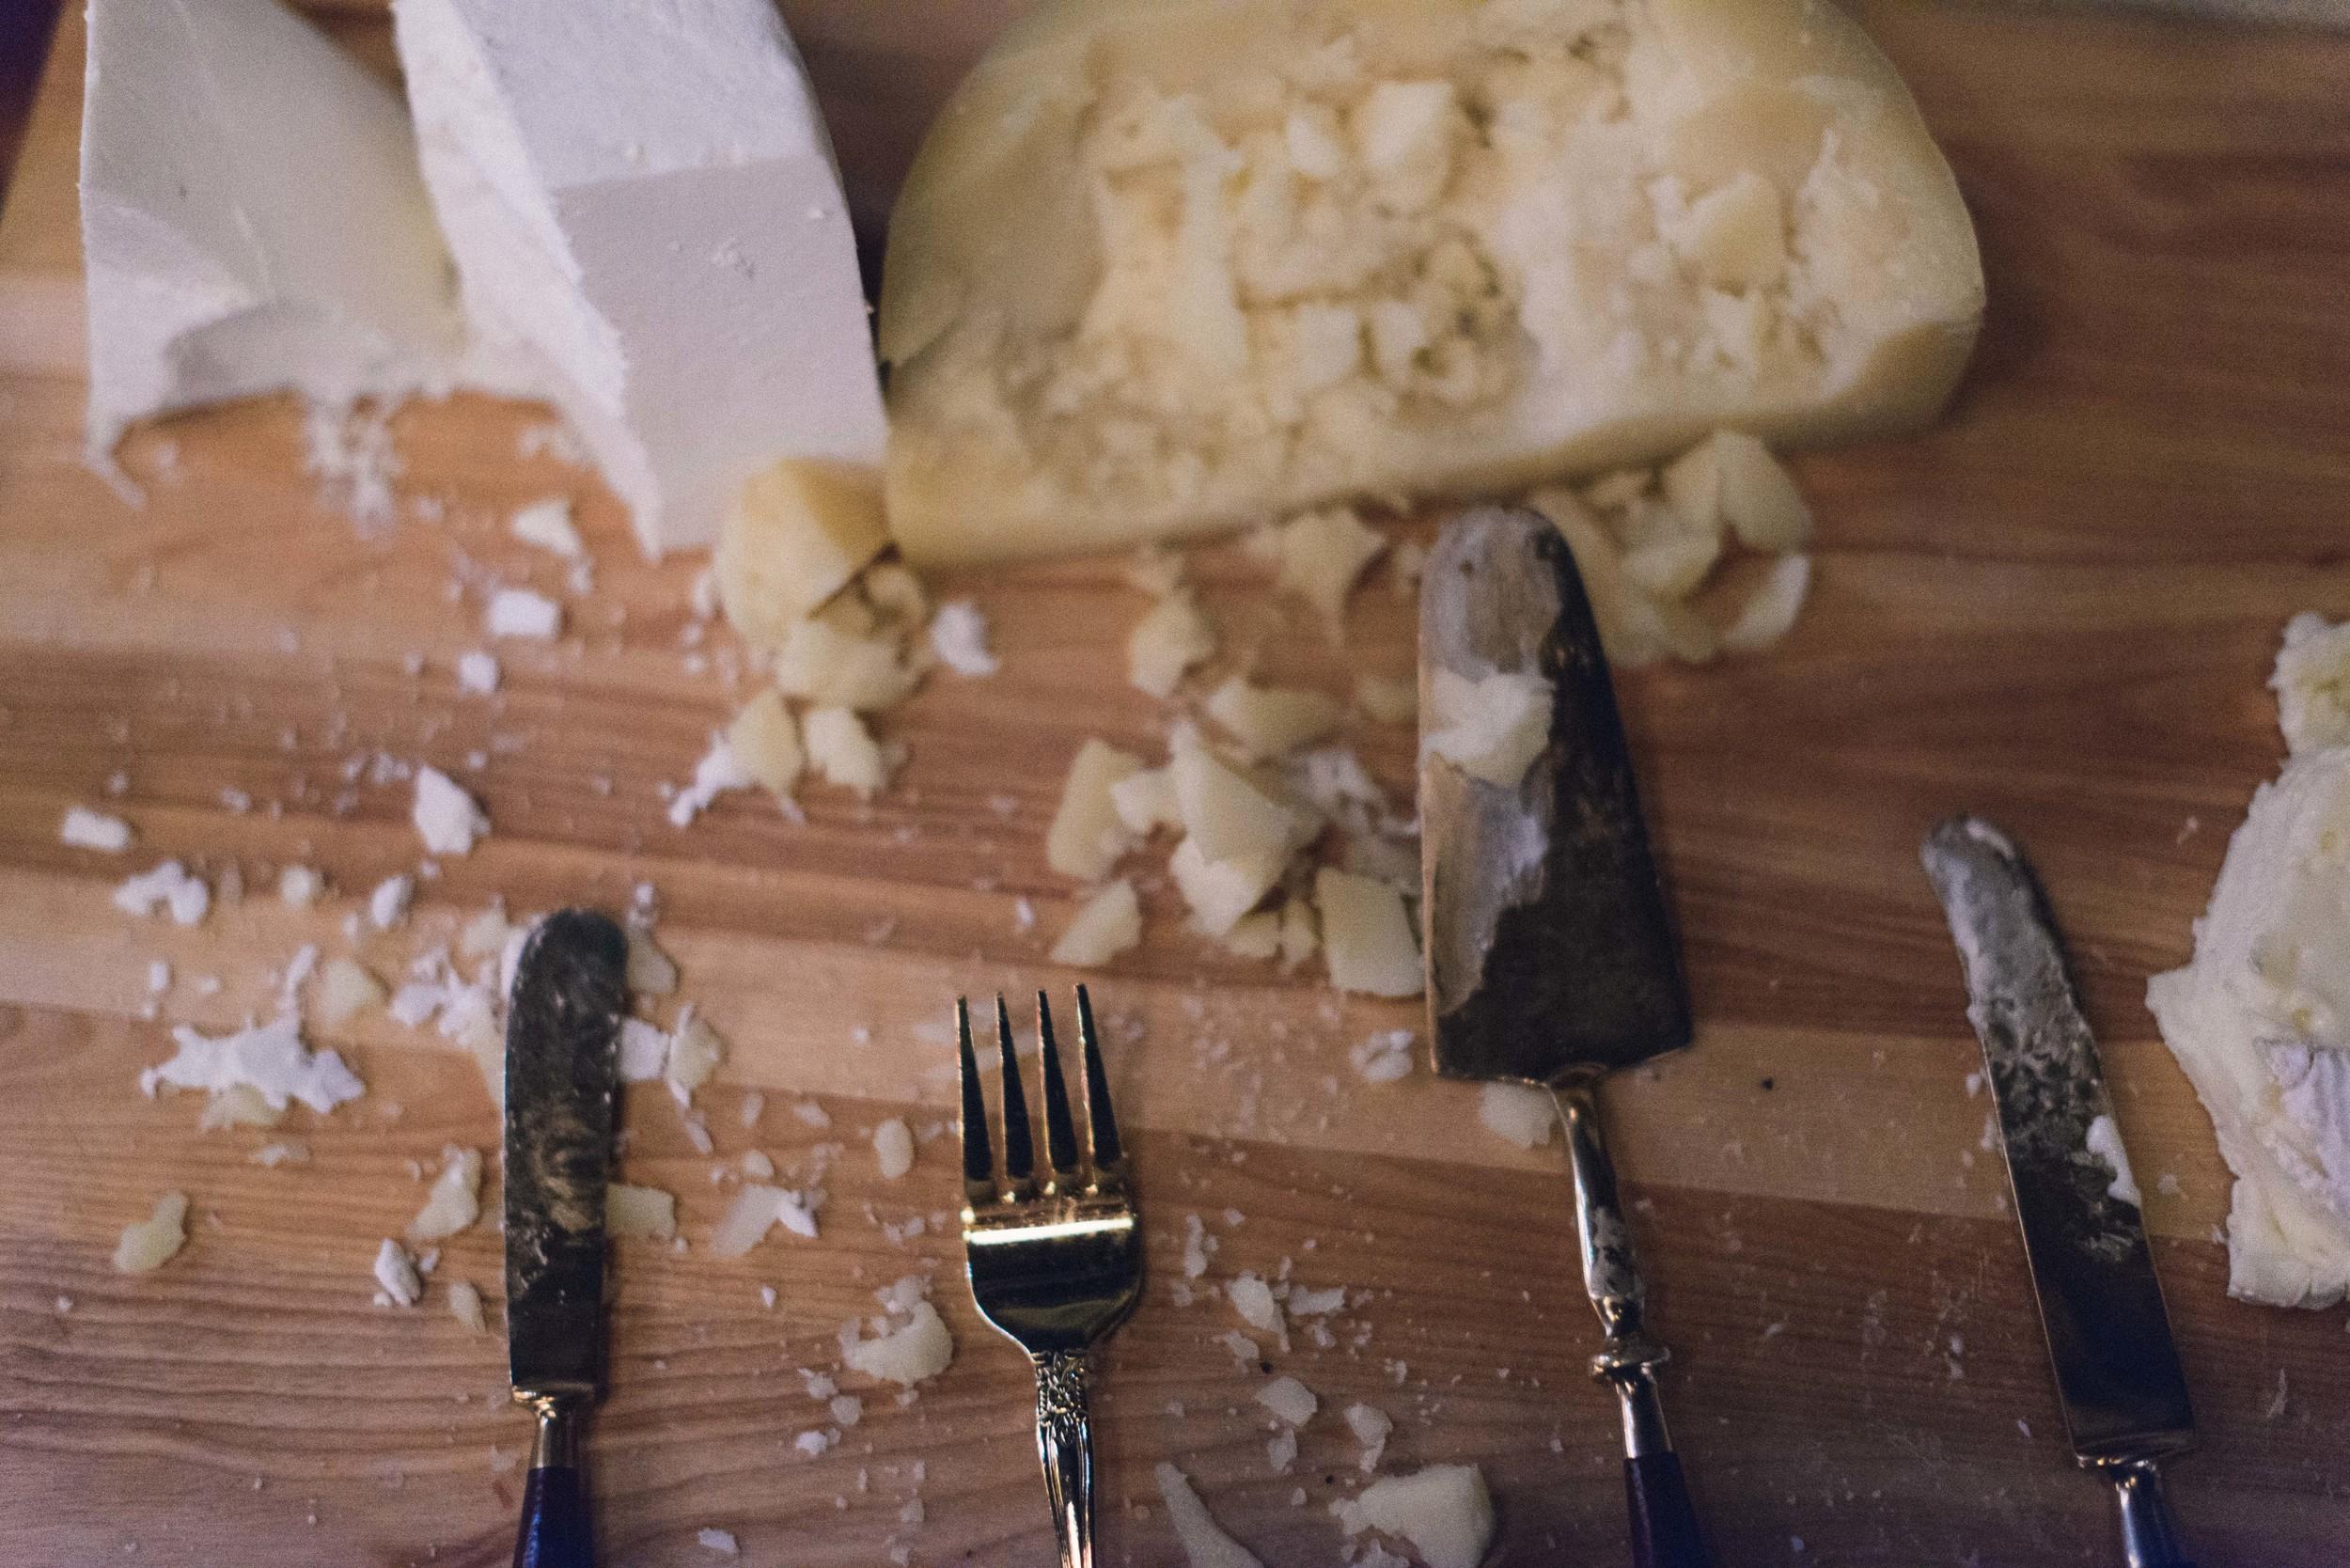 Purslane-Catering-by-Kate-Ignatowski-Photography-152.jpg